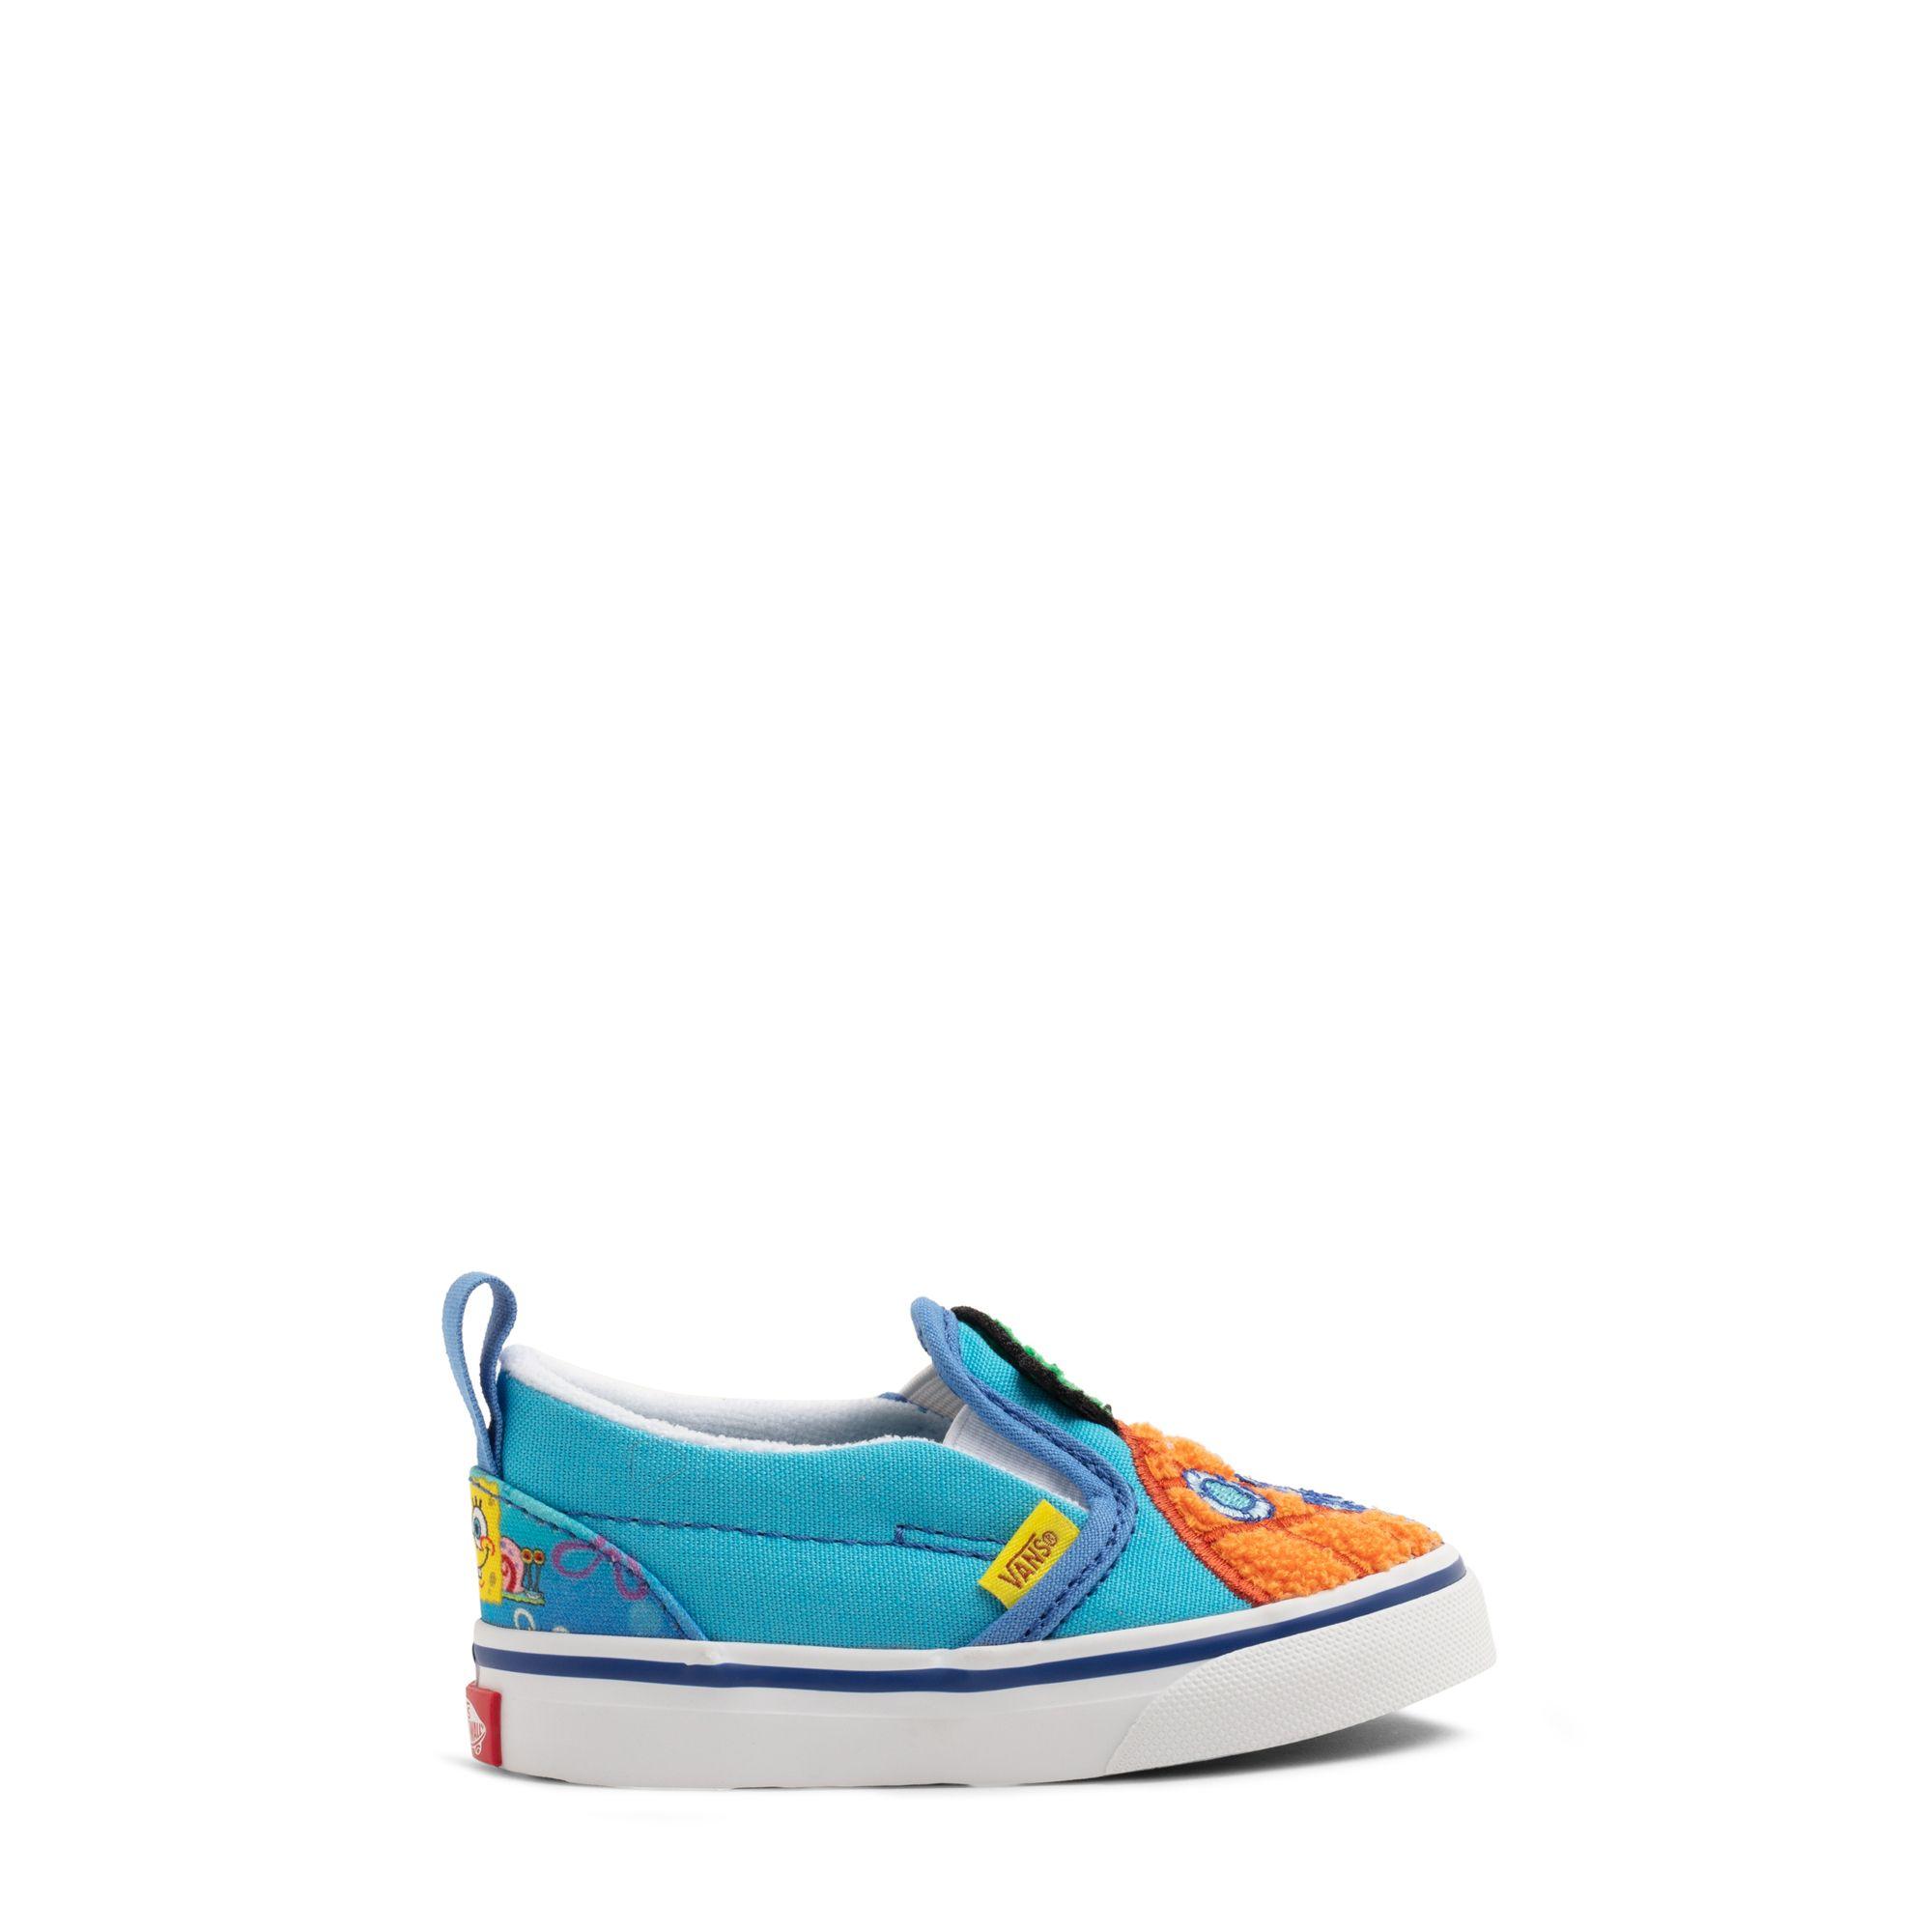 x SpongeBob classic slip-on sneakers